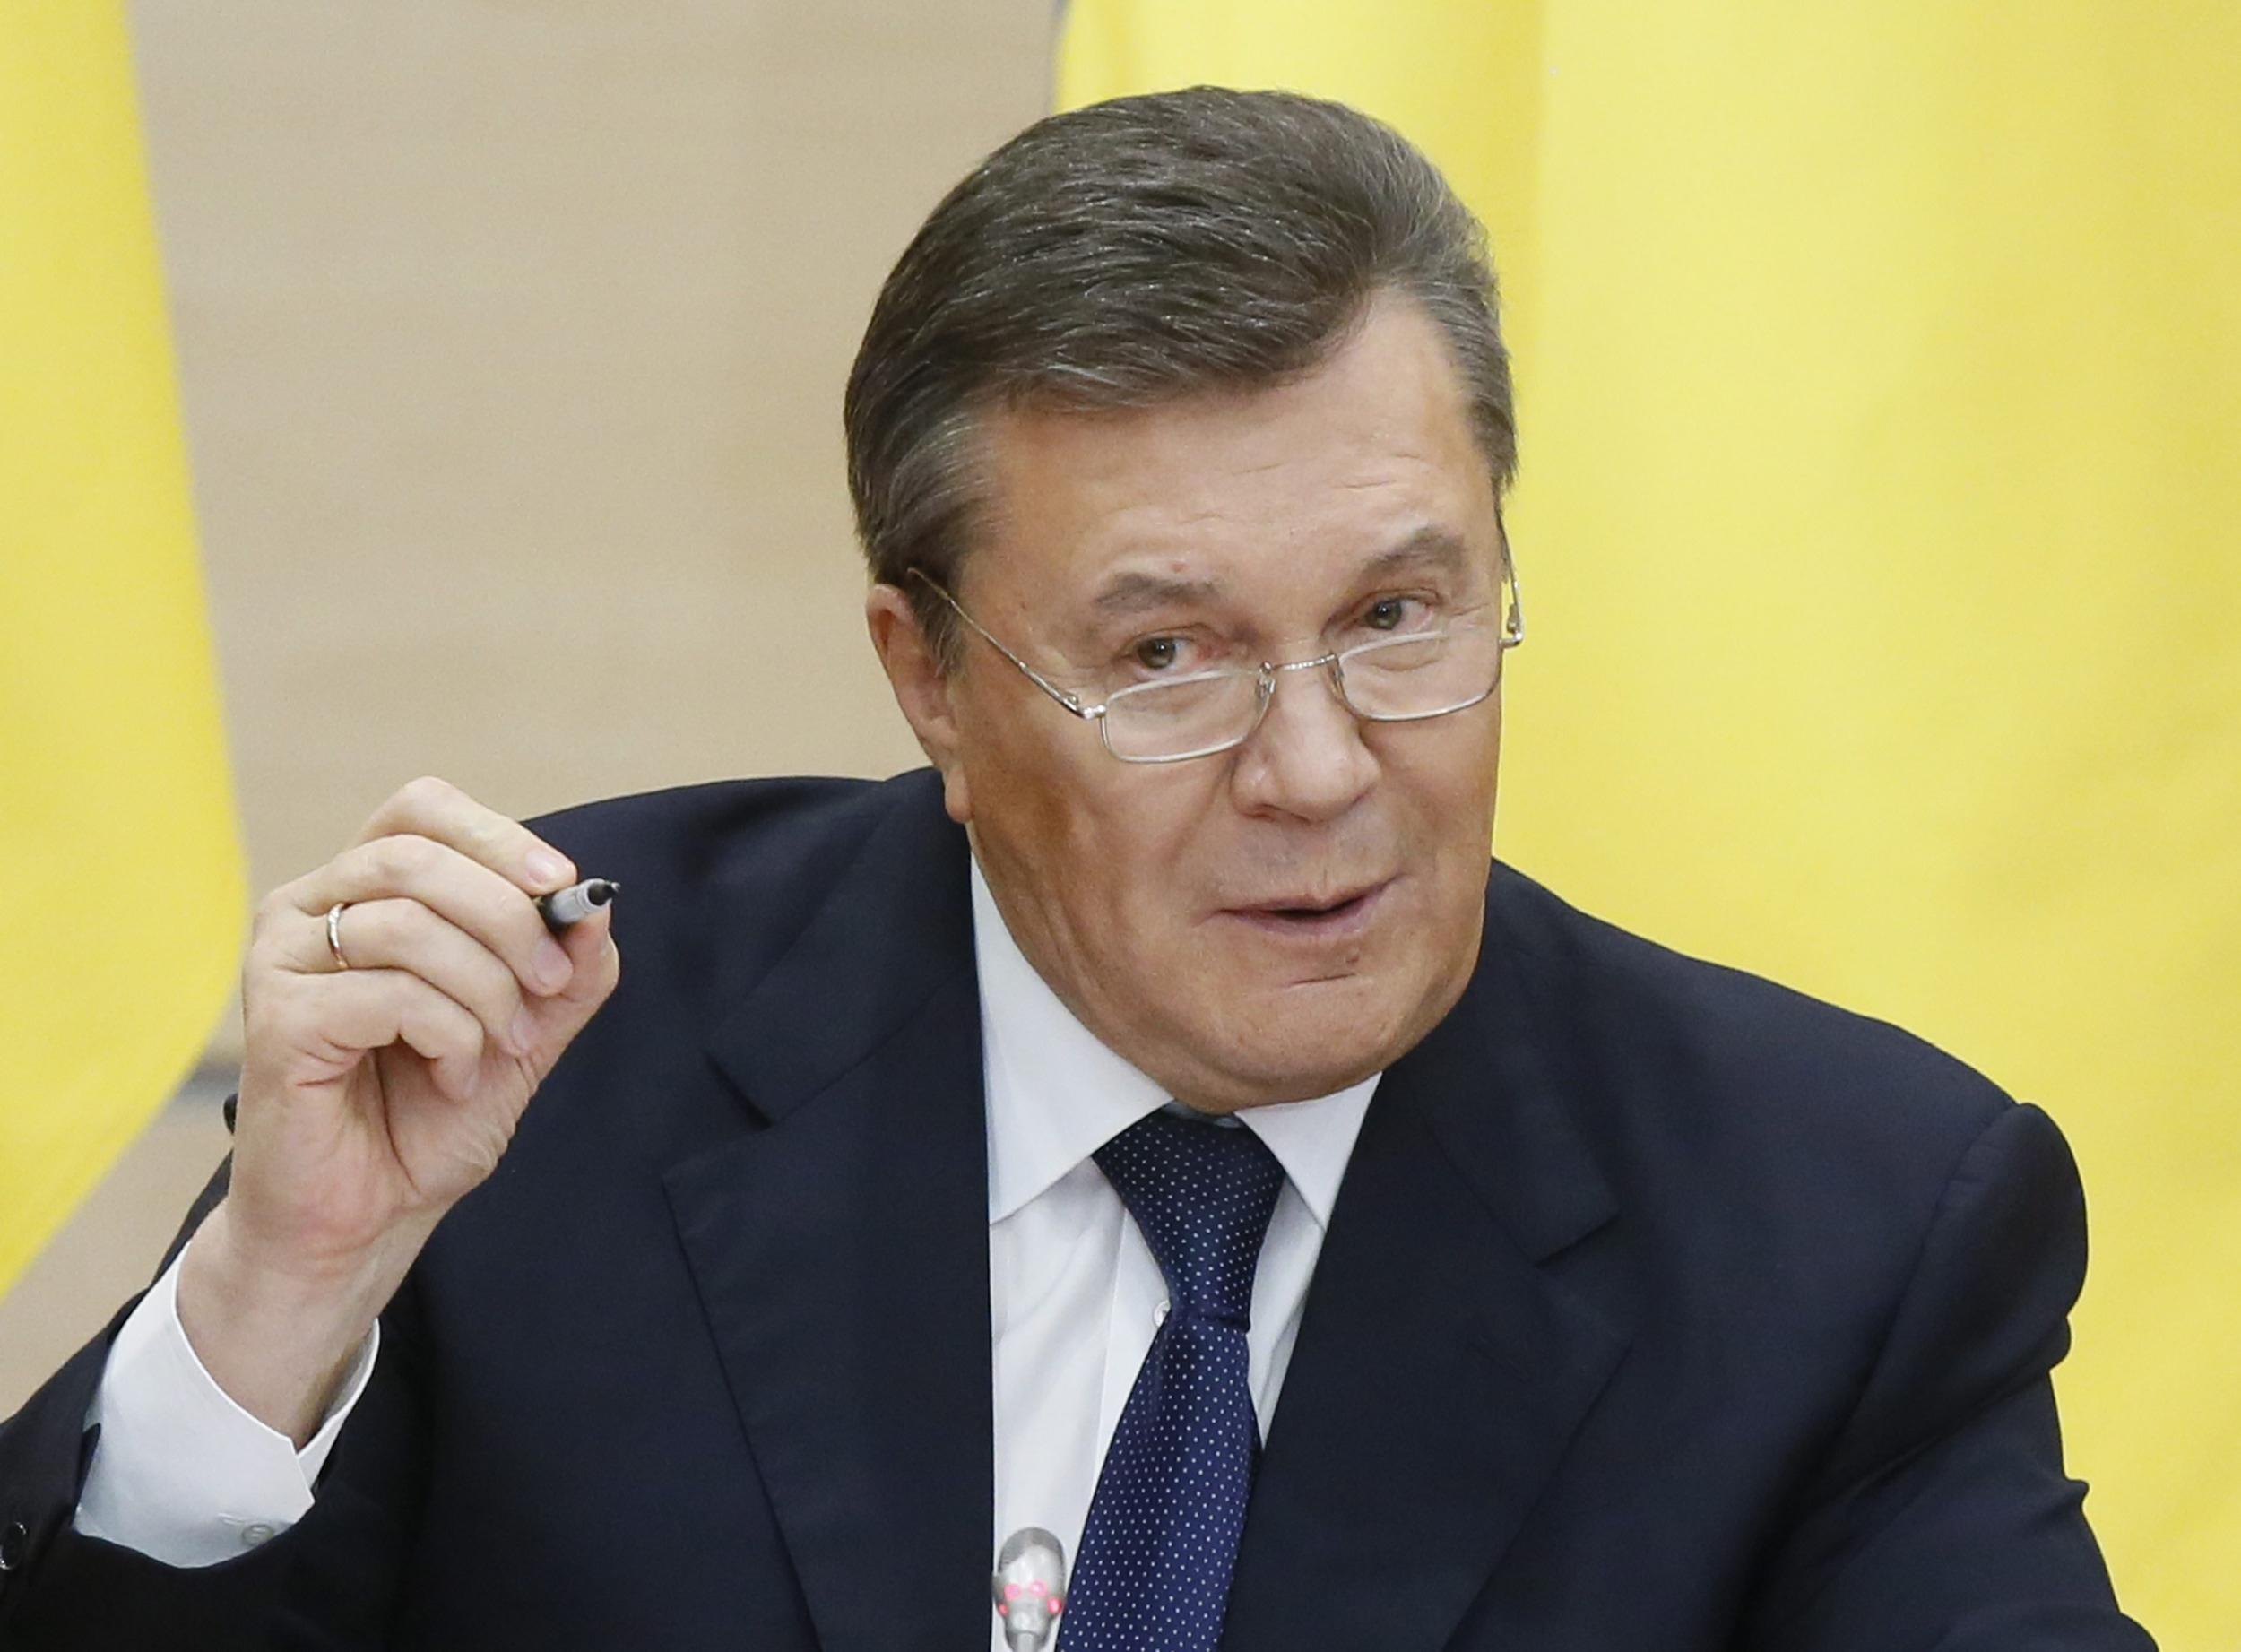 Image: Former Ukrainian President Viktor Yanukovych